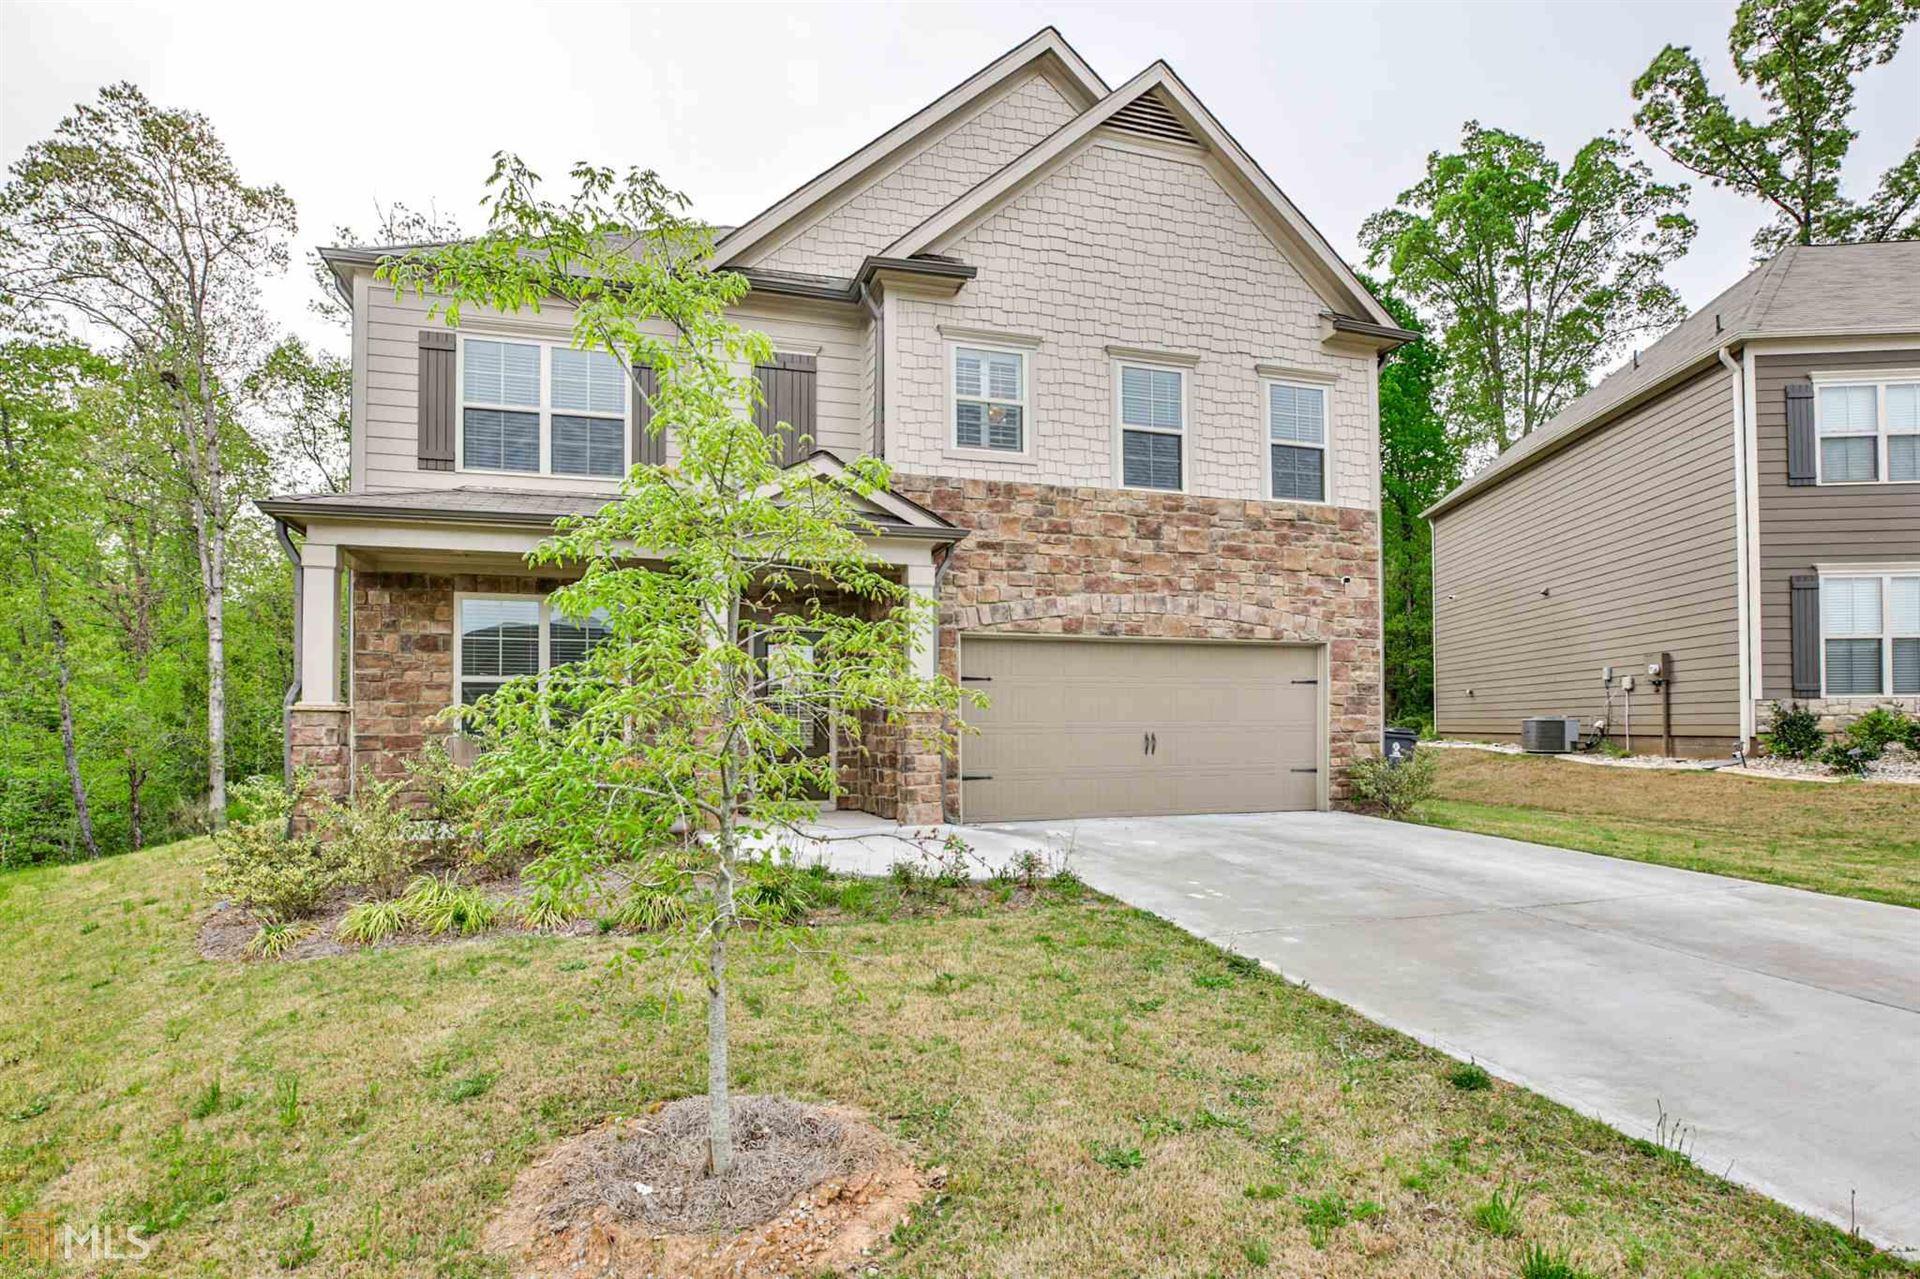 5158 Amberland, Atlanta, GA 30349 - #: 8962883